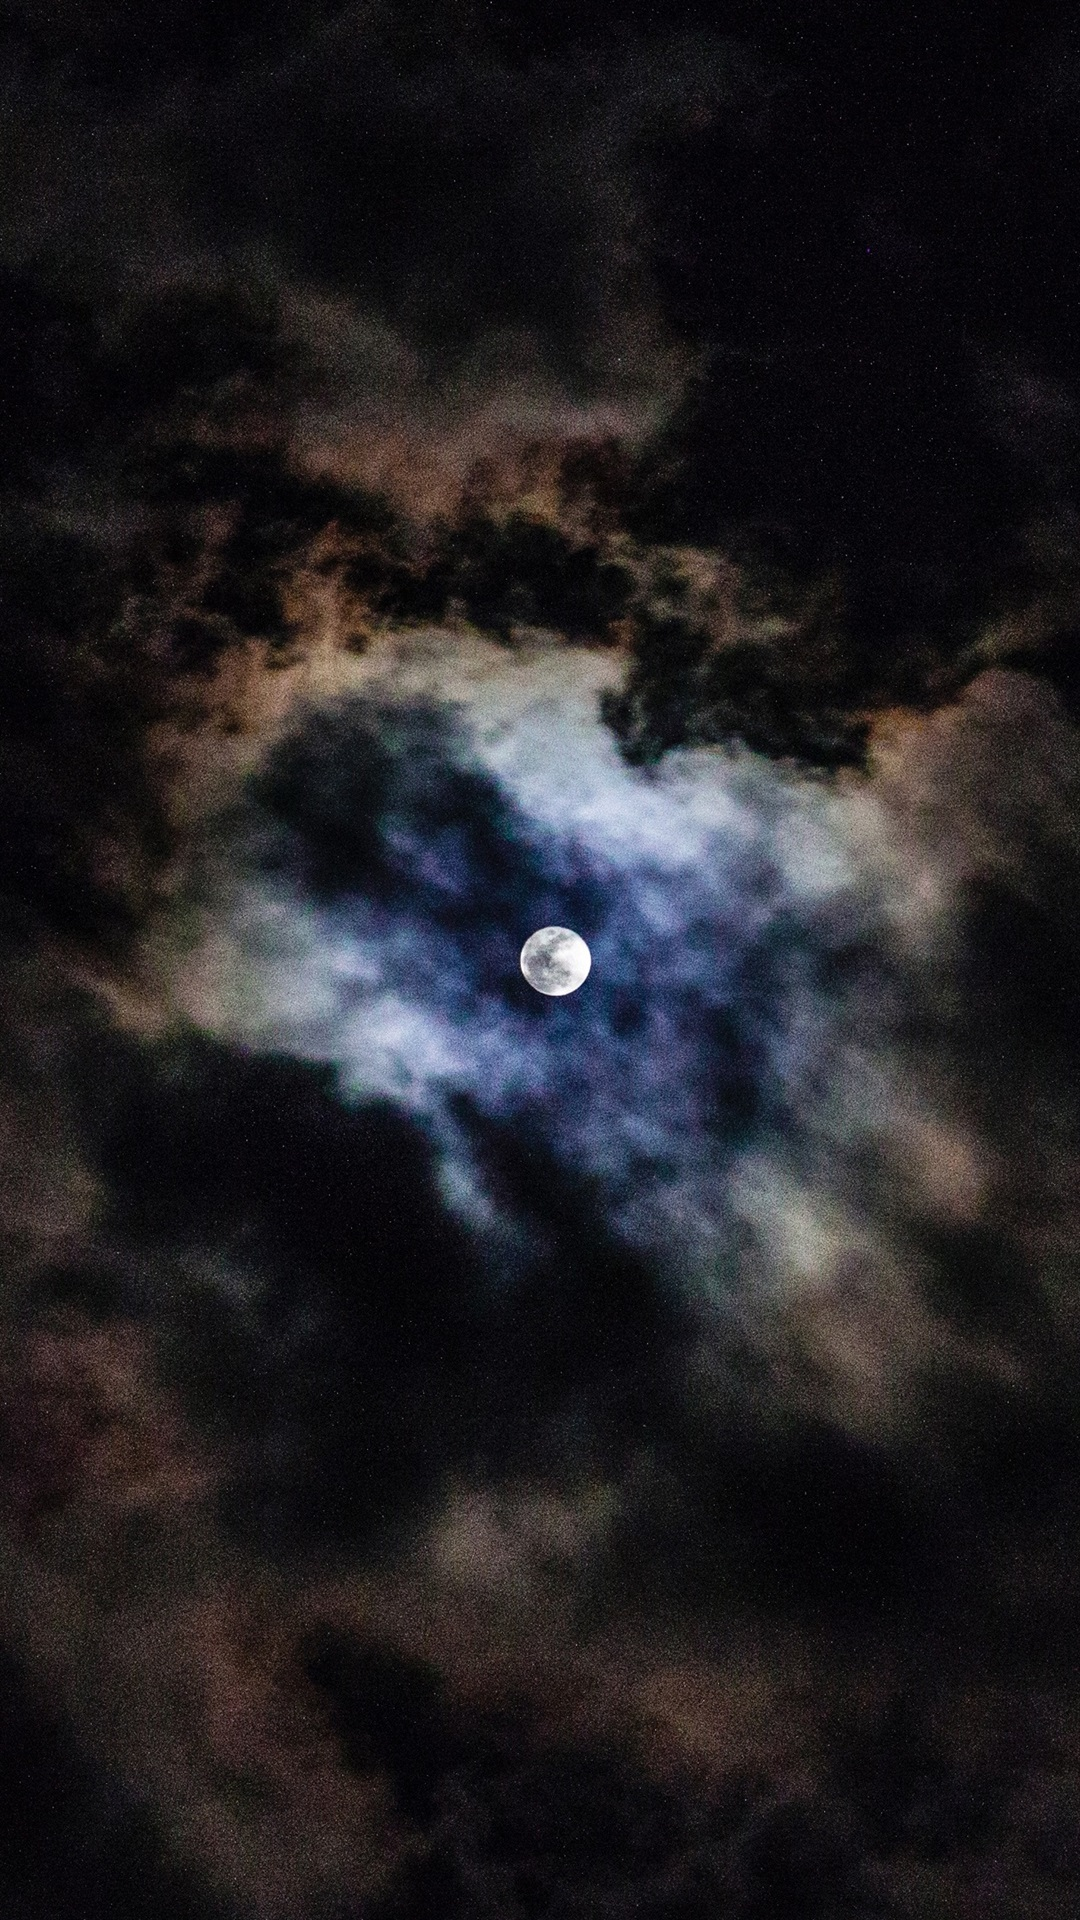 Moon Clouds Sky Night 1080x1920 Iphone 8 7 6 6s Plus